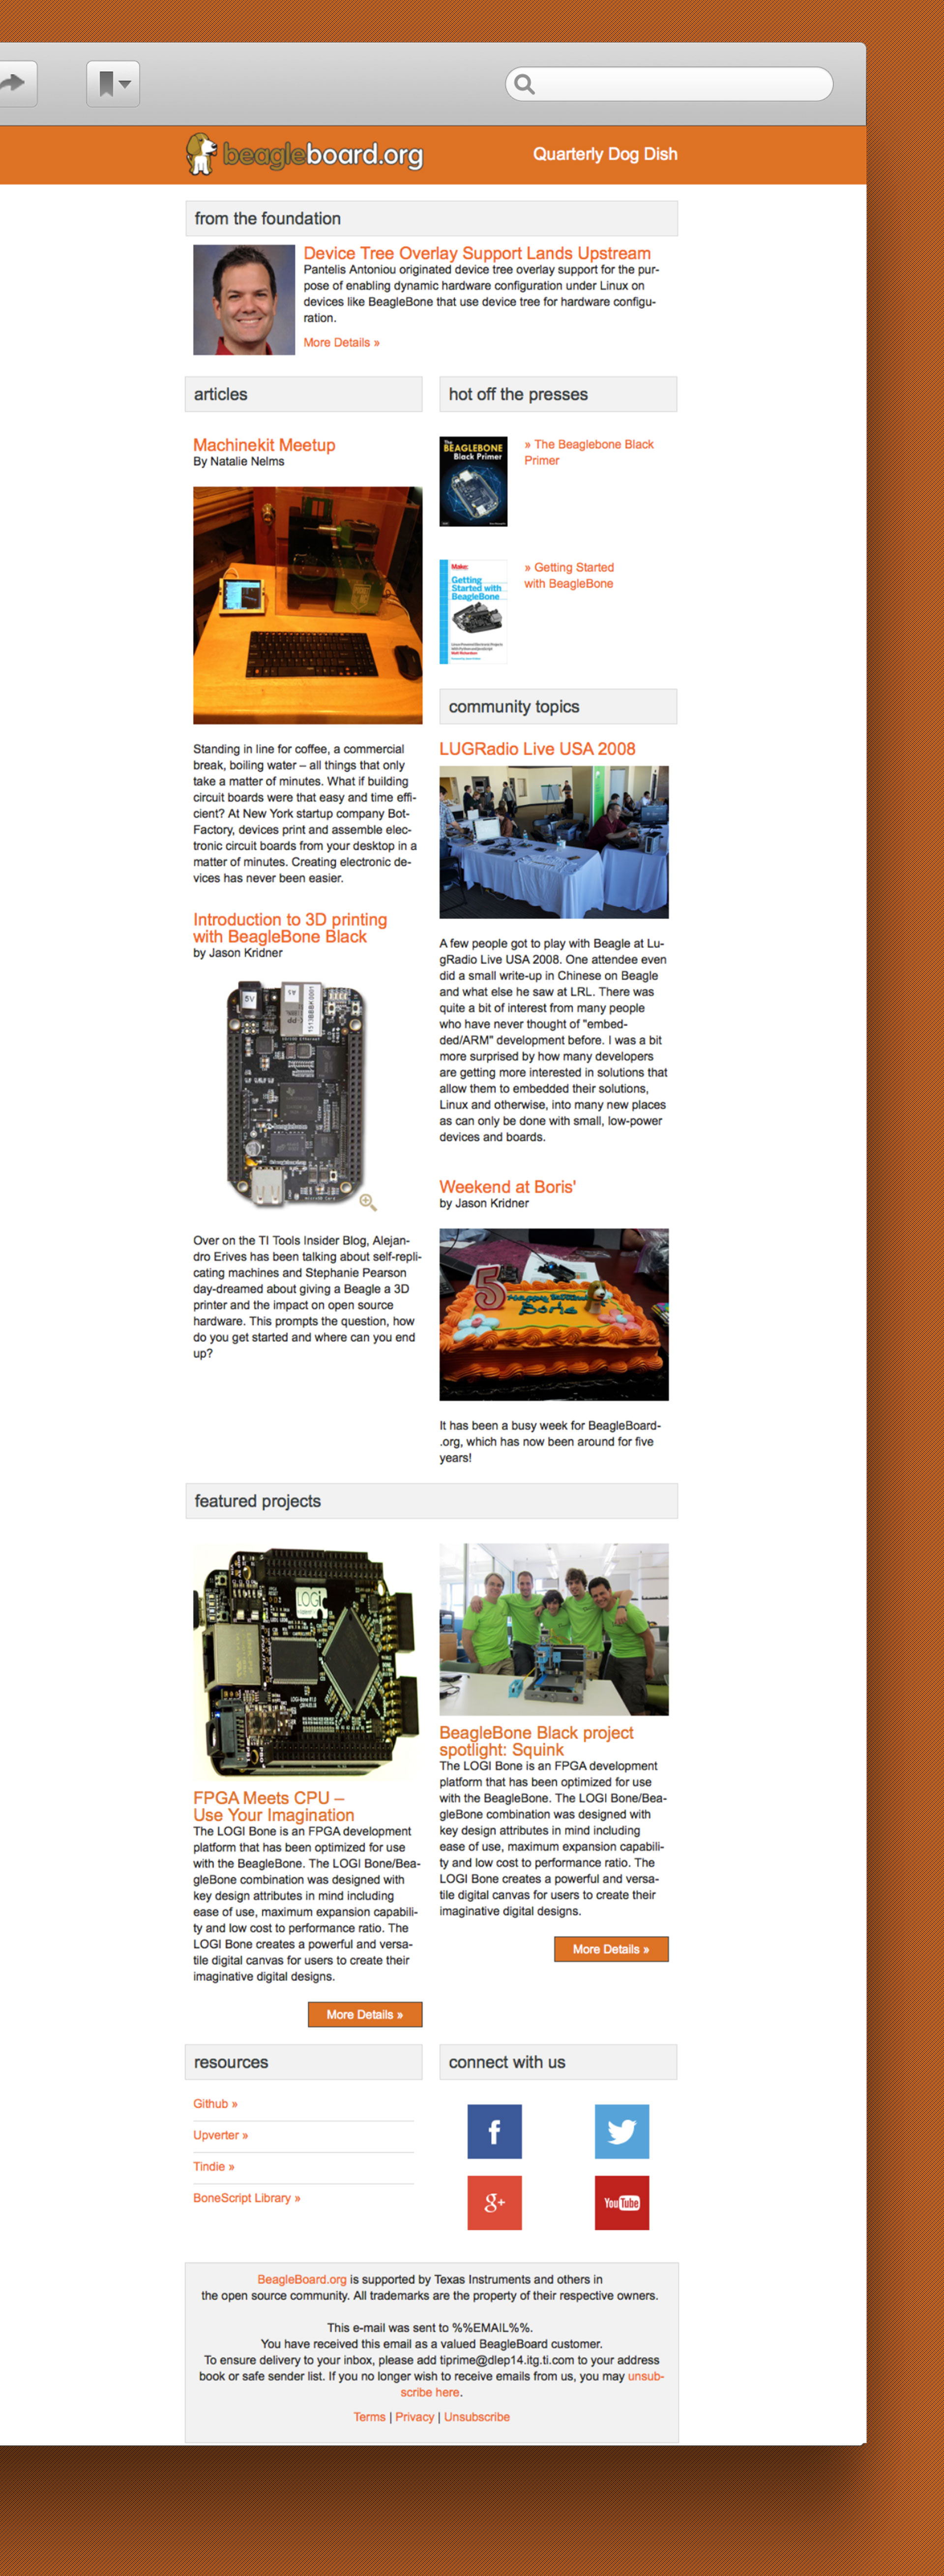 beagle board.org Newsletter